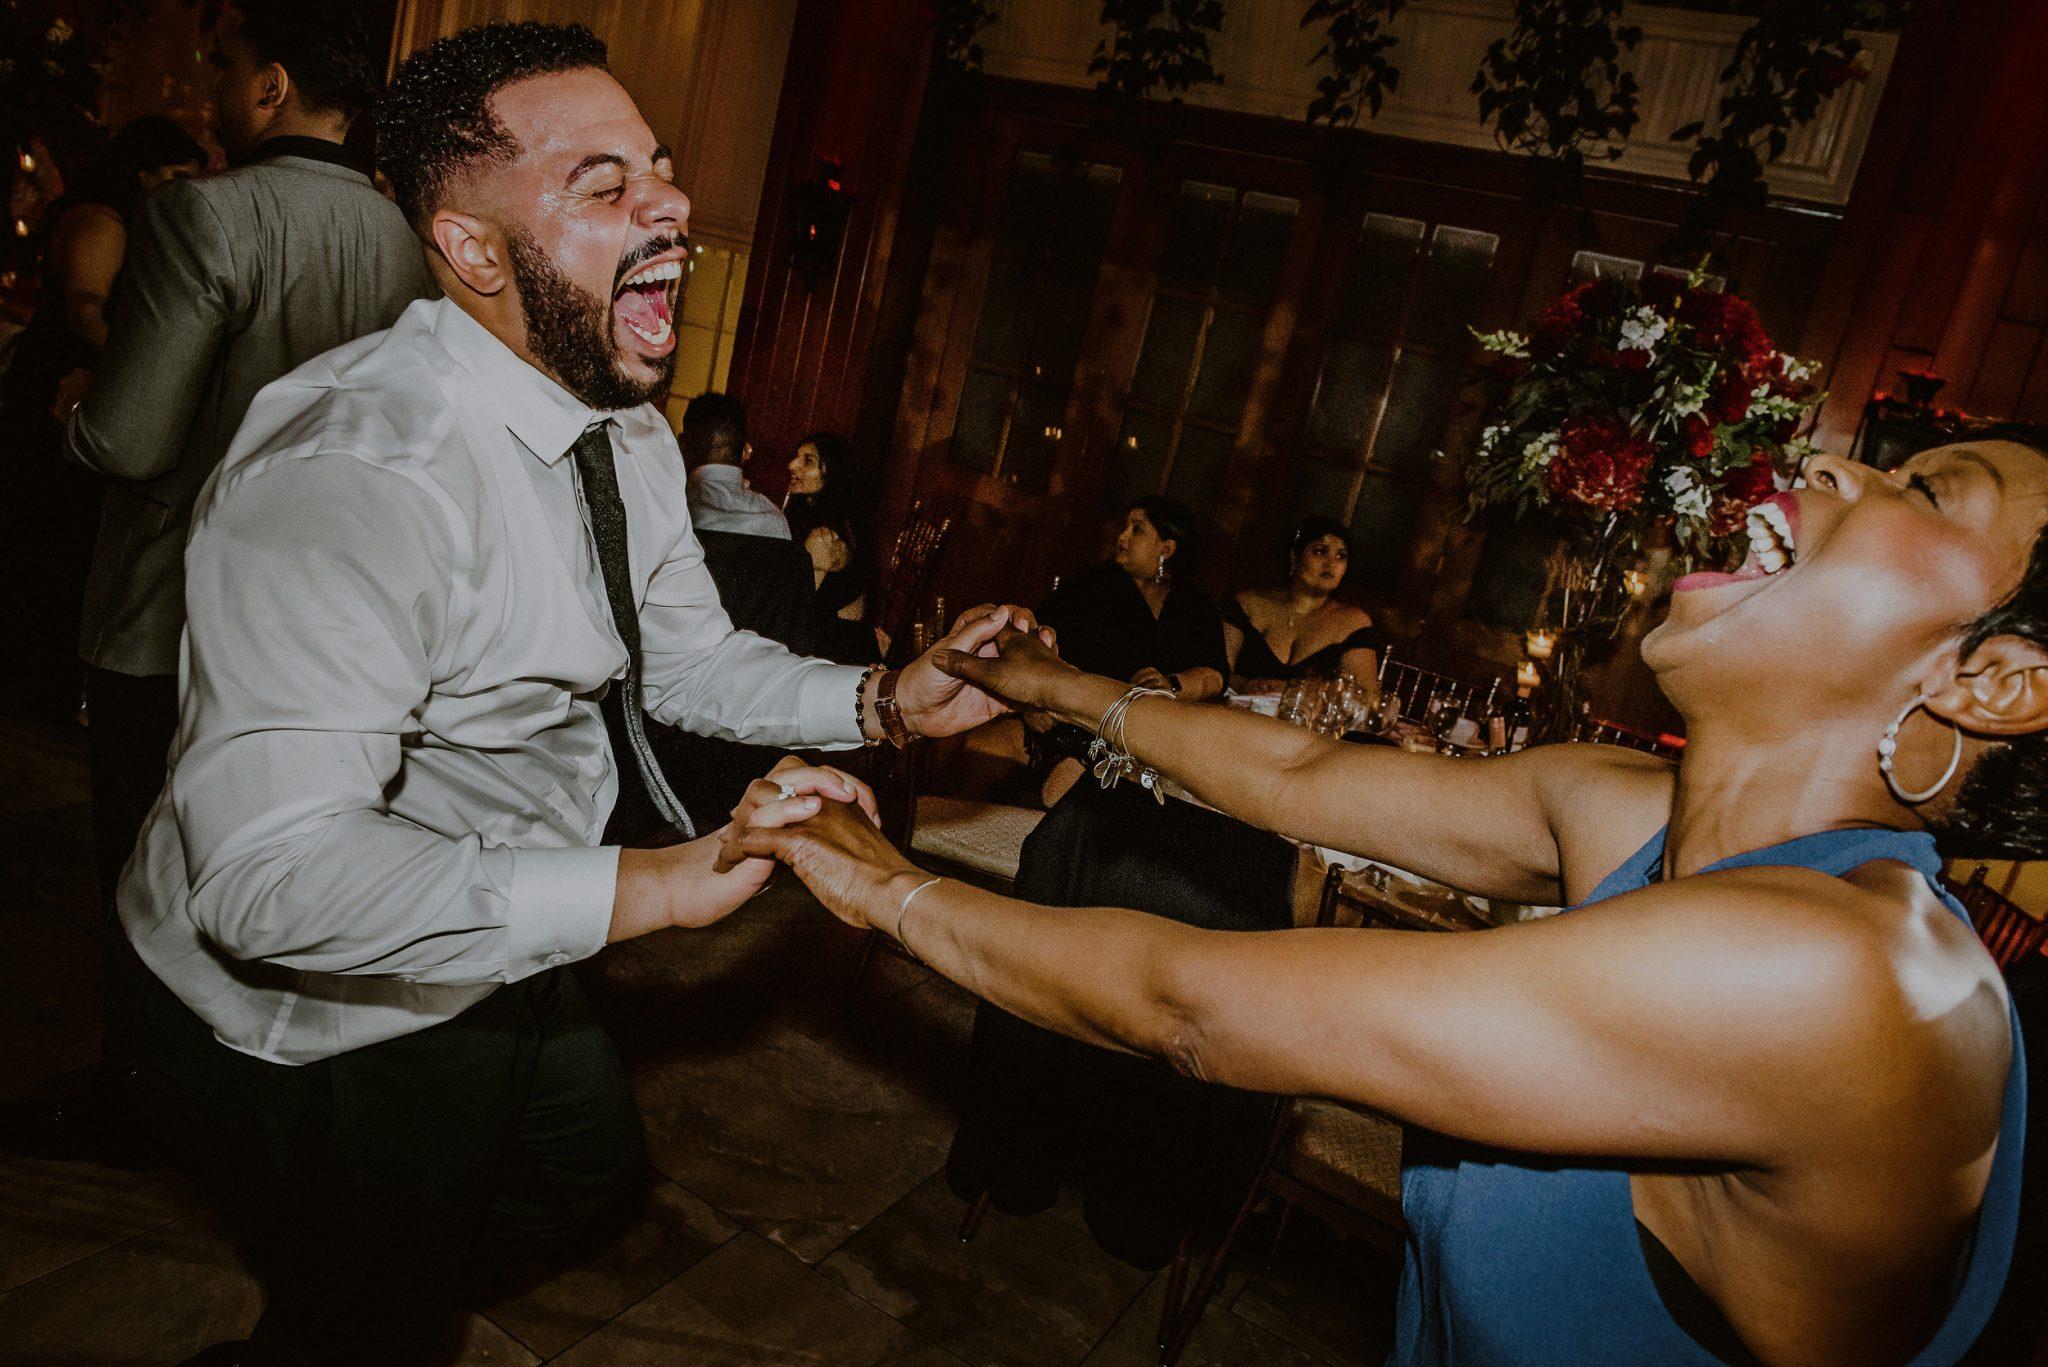 fun wedding dancing moments